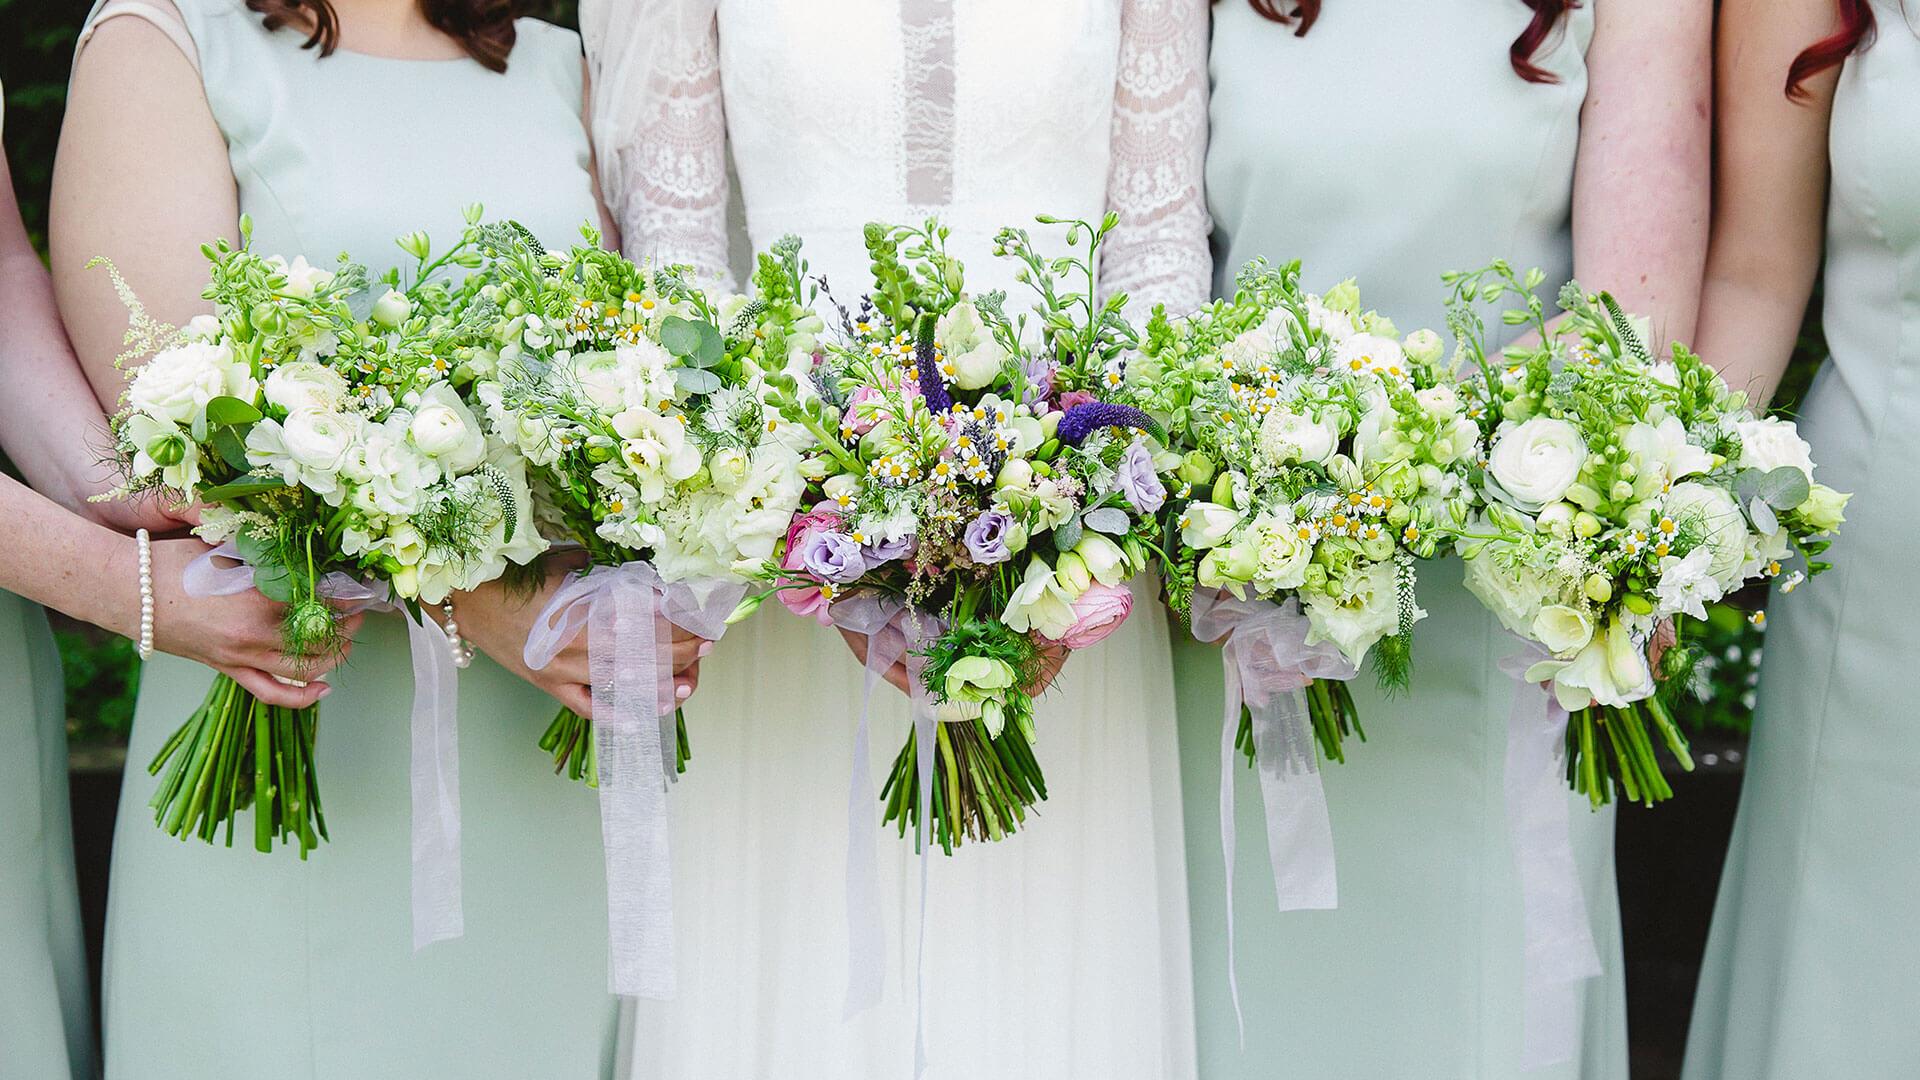 Pretty white and green wedding flowers - wedding ideas